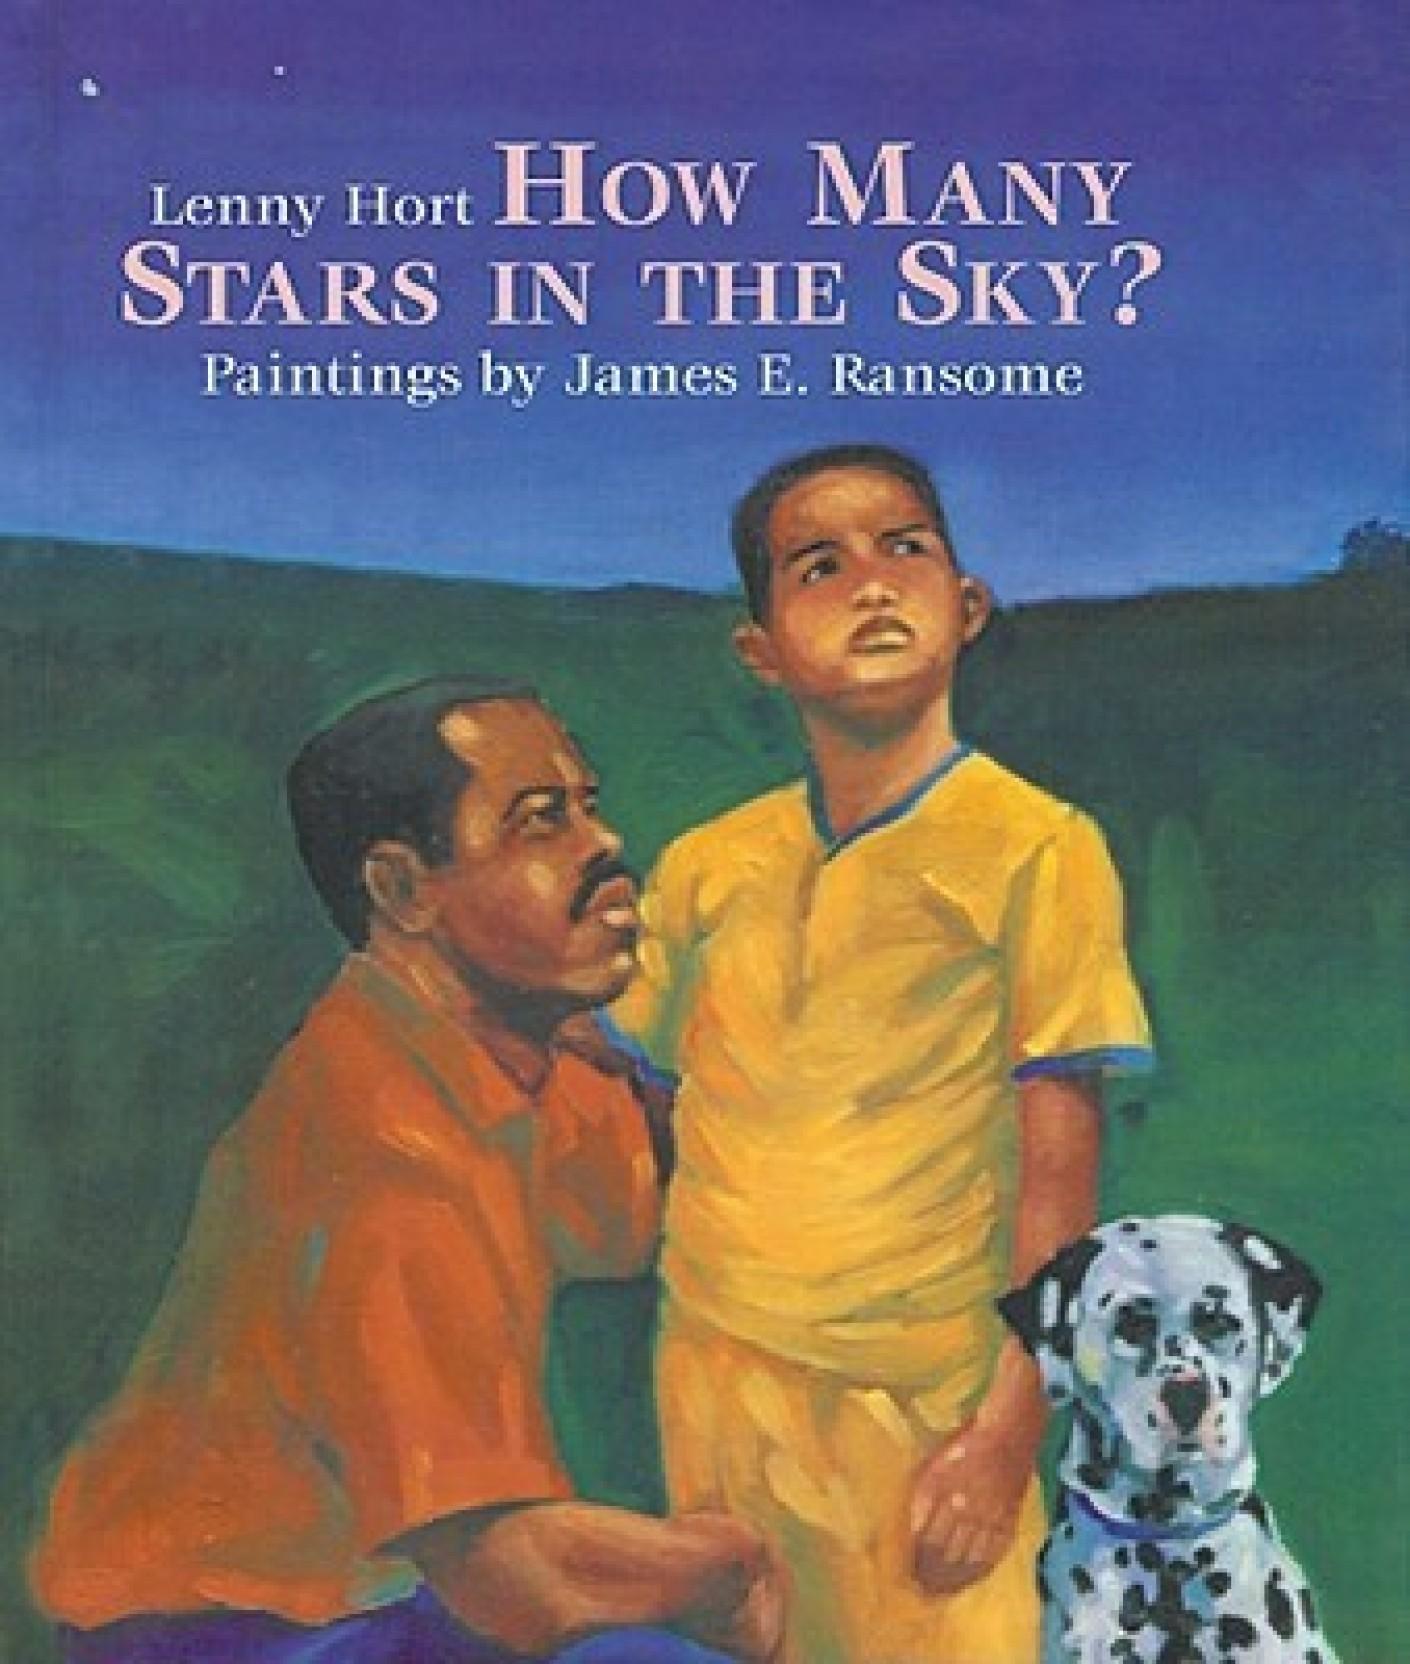 How Many Stars in the Sky?